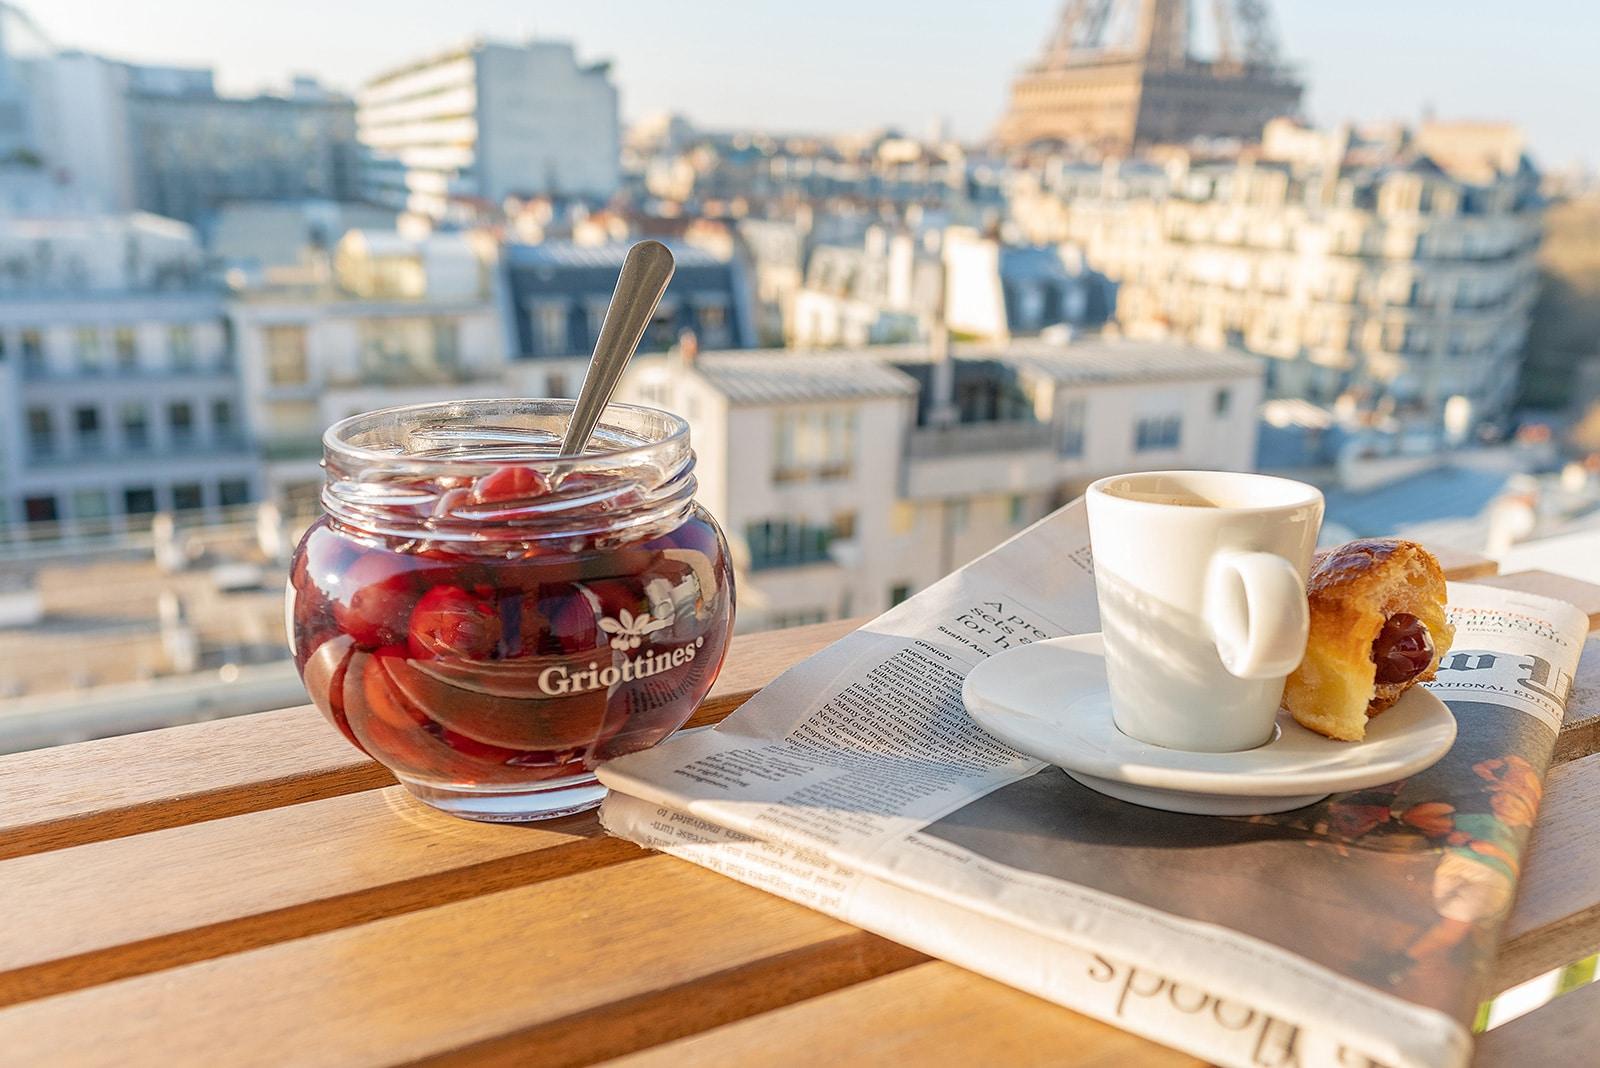 Shooting Griottines Paris